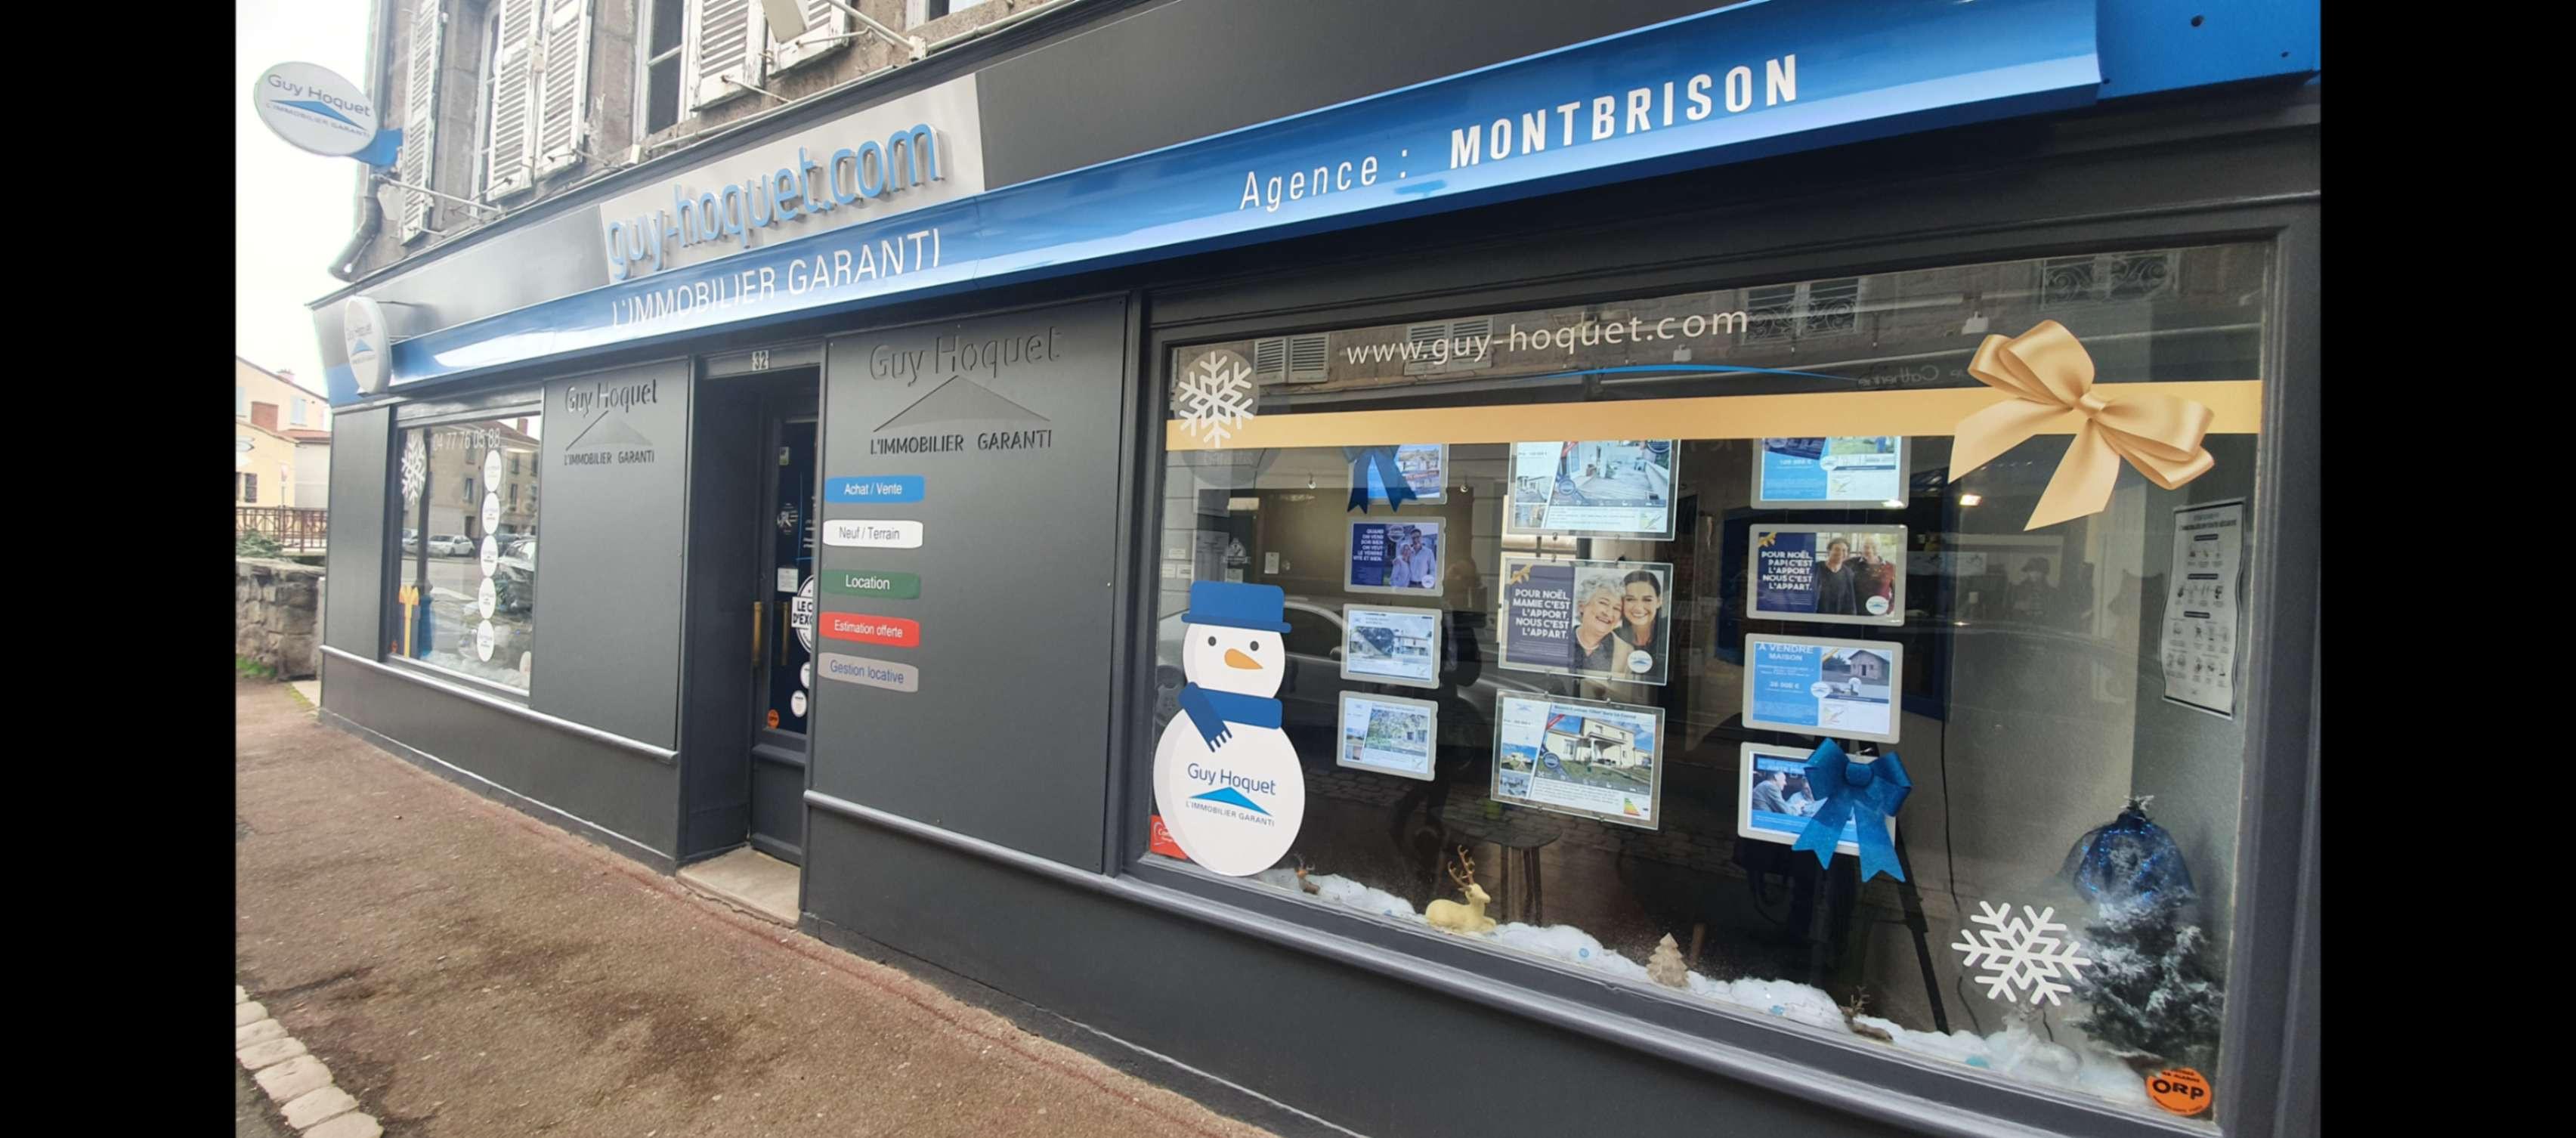 Agence Guy Hoquet MONTBRISON